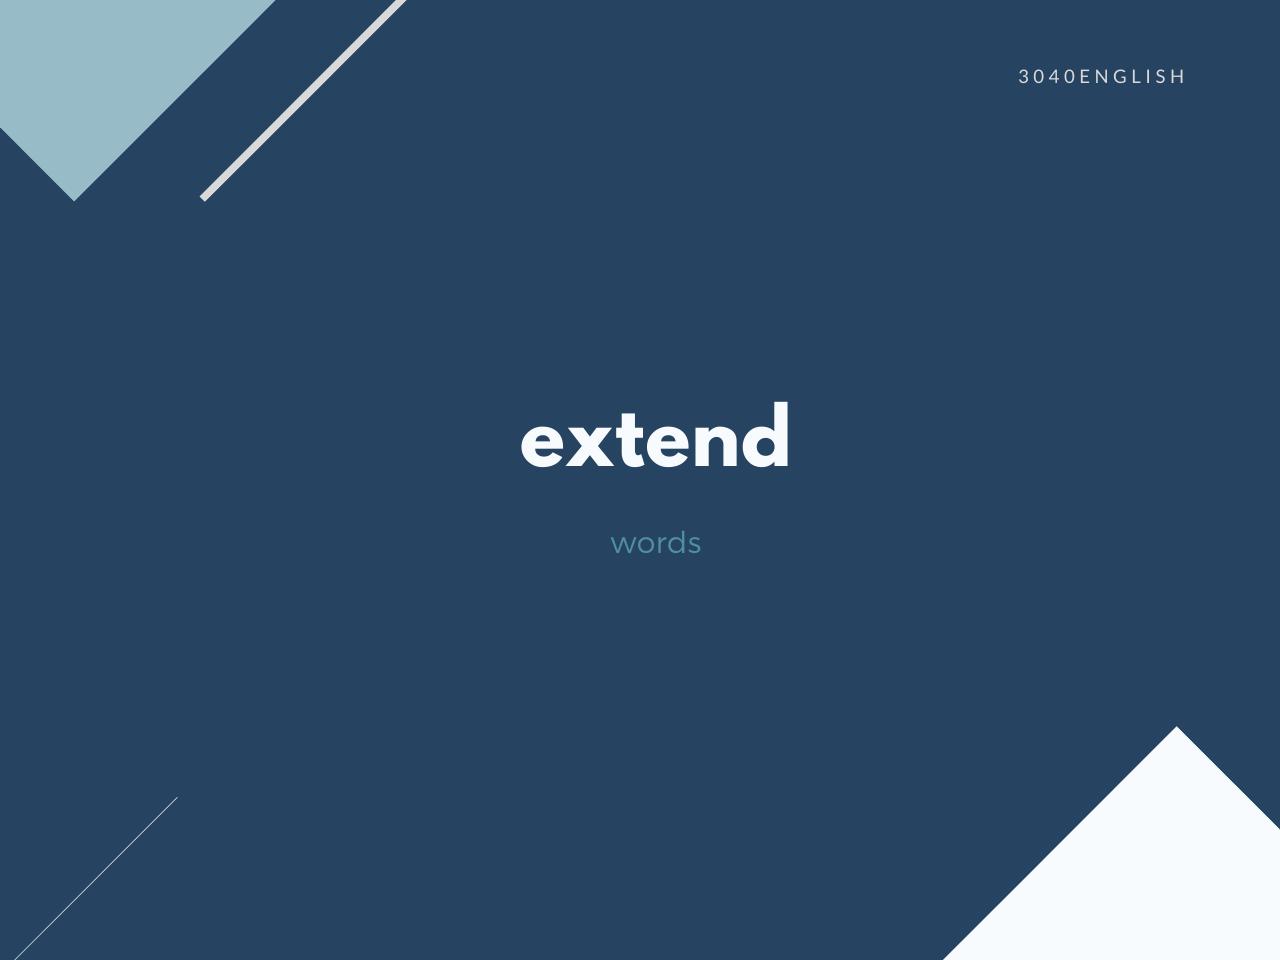 extend の意味と簡単な使い方【音読用例文あり】